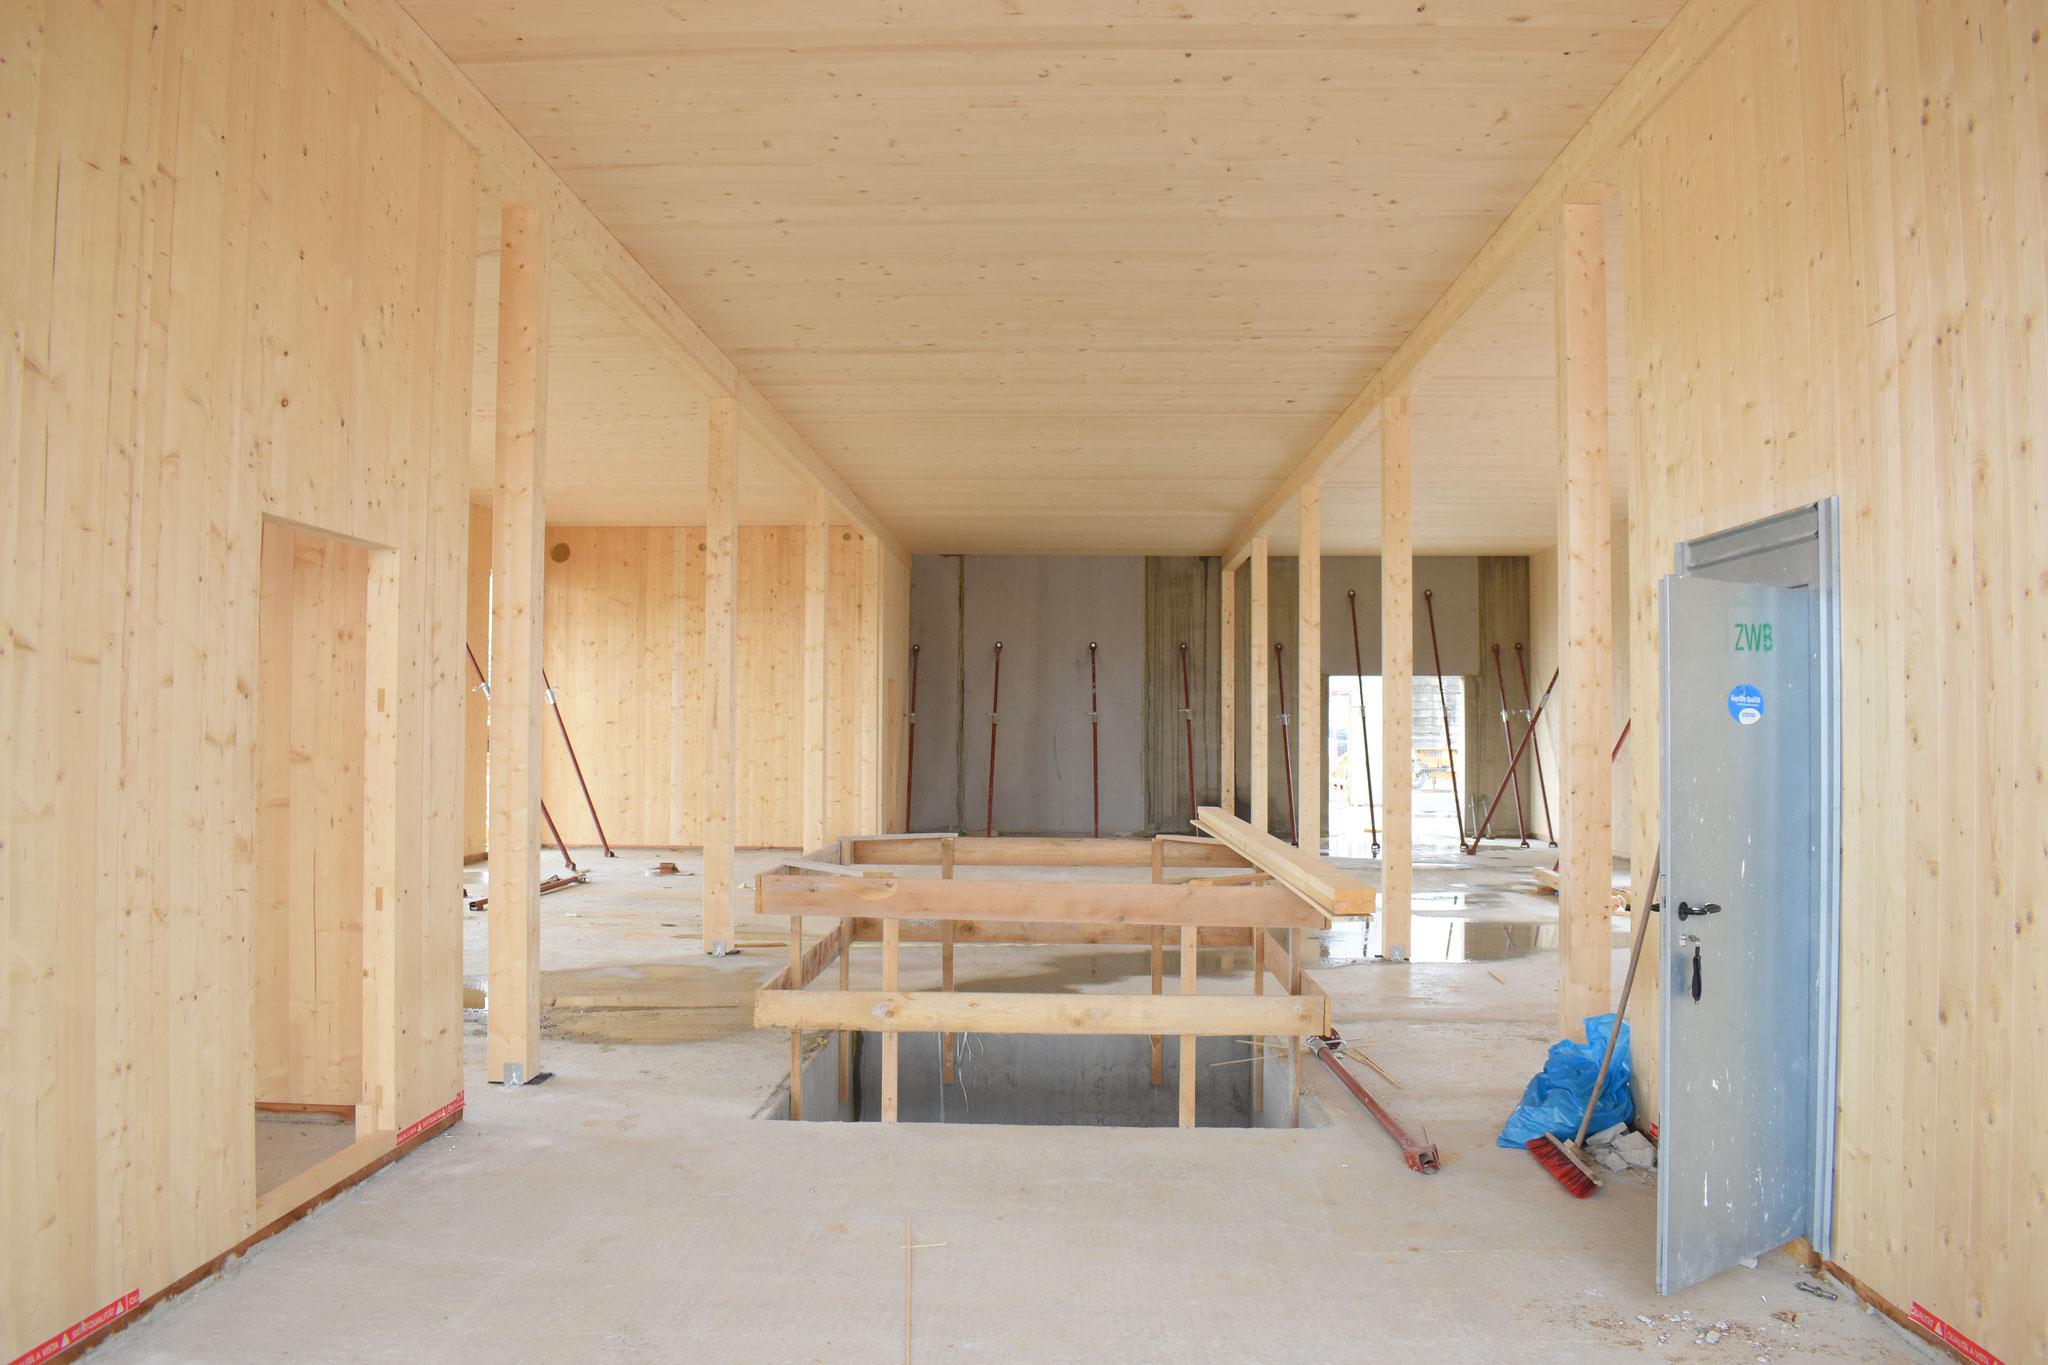 Bauteil 4 - Zugang zum Archiv im Kellergeschoss